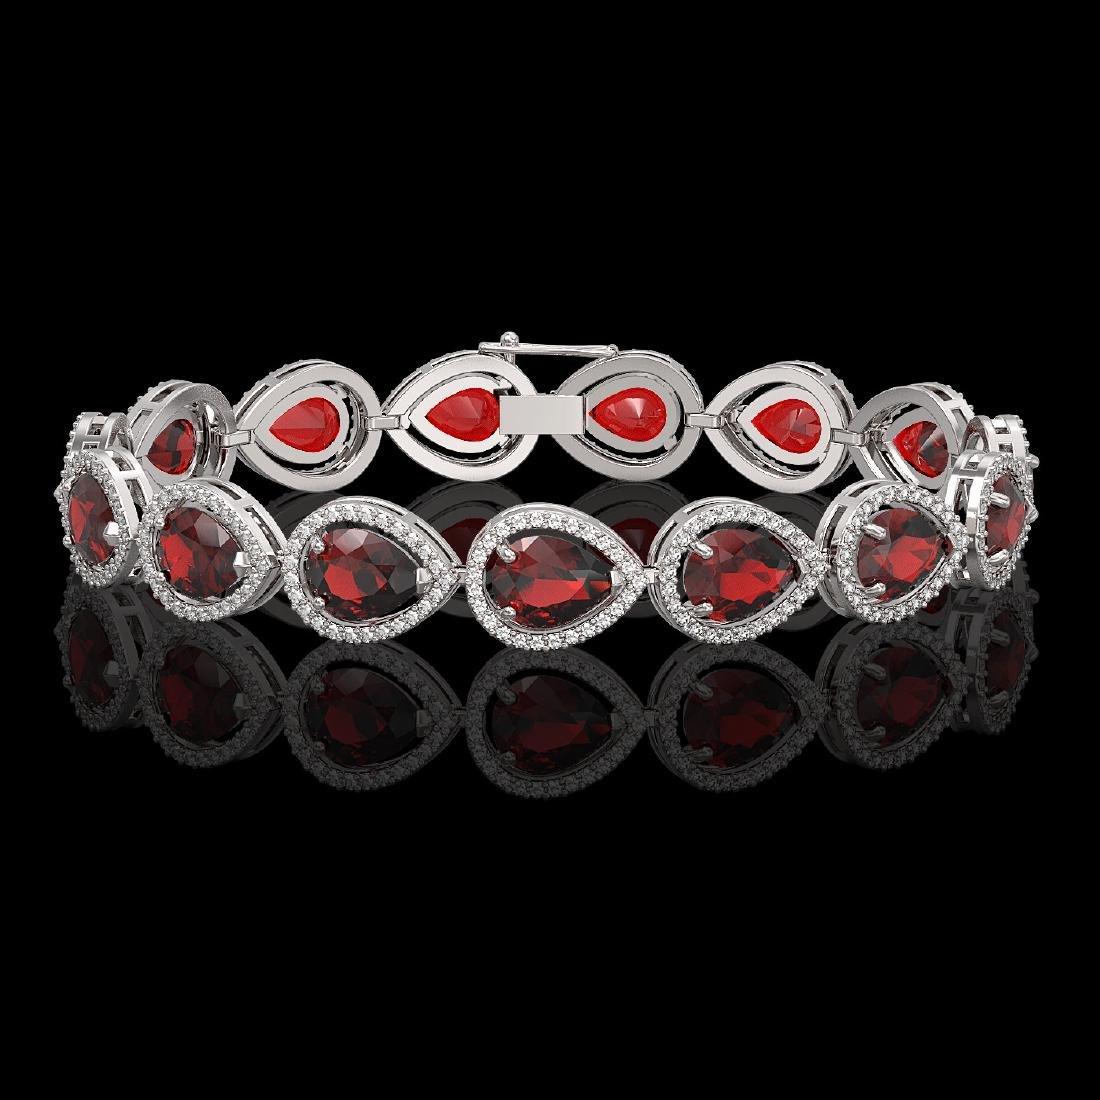 17.45 CTW Garnet & Diamond Halo Bracelet 10K White Gold